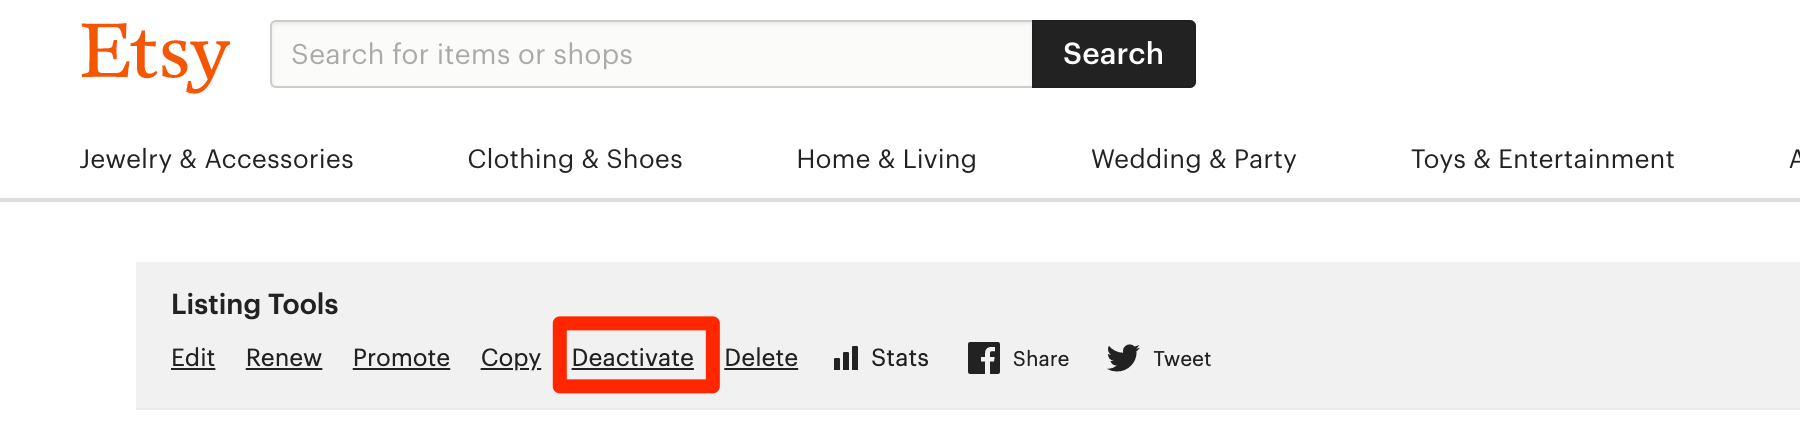 Etsy variation listing deactivate